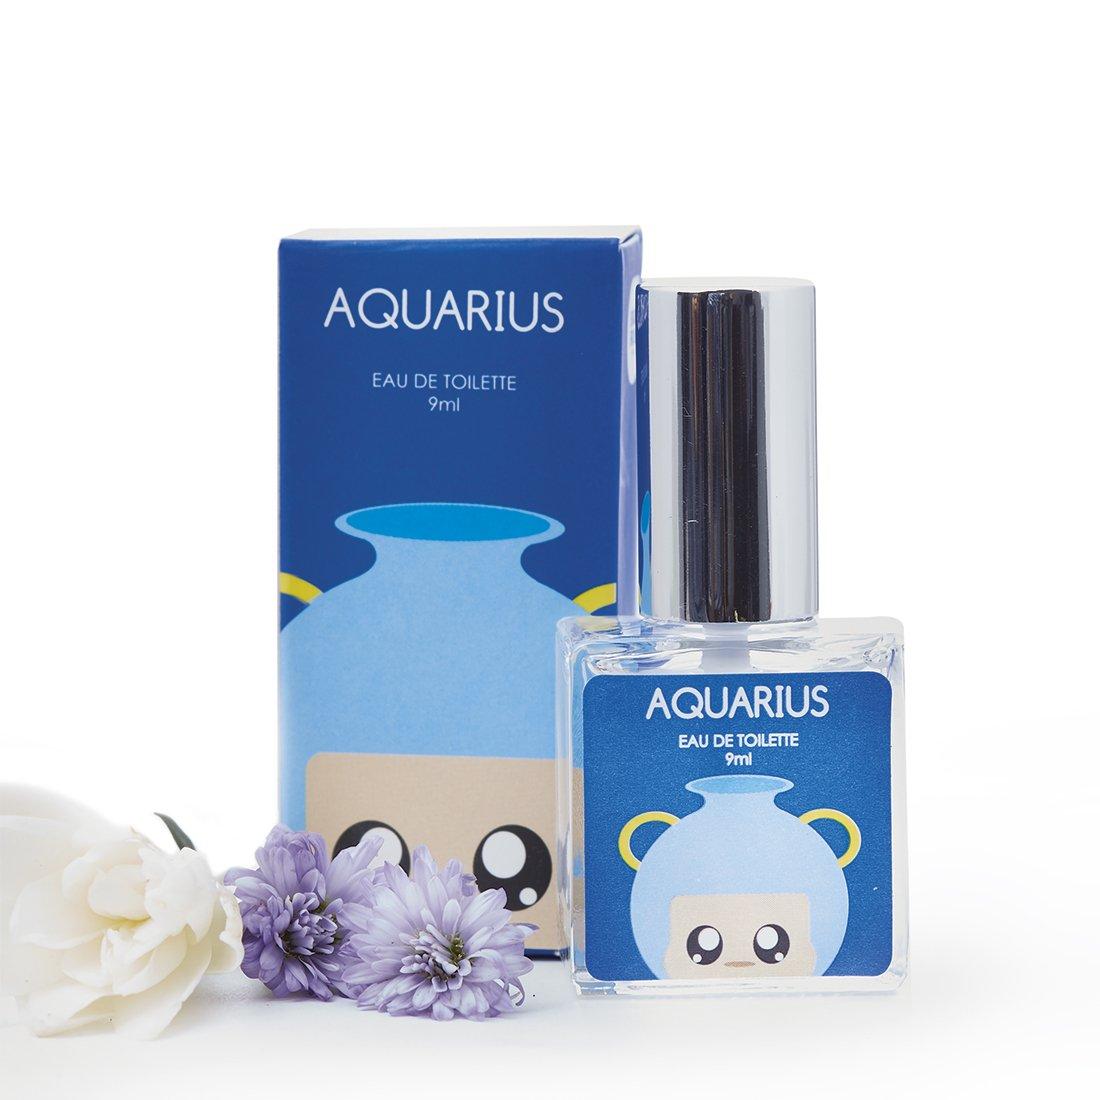 Ini-Dia-Rekomendasi-Parfum-Sesuai-Zodiak-Dari-Brunbrun-aquarius